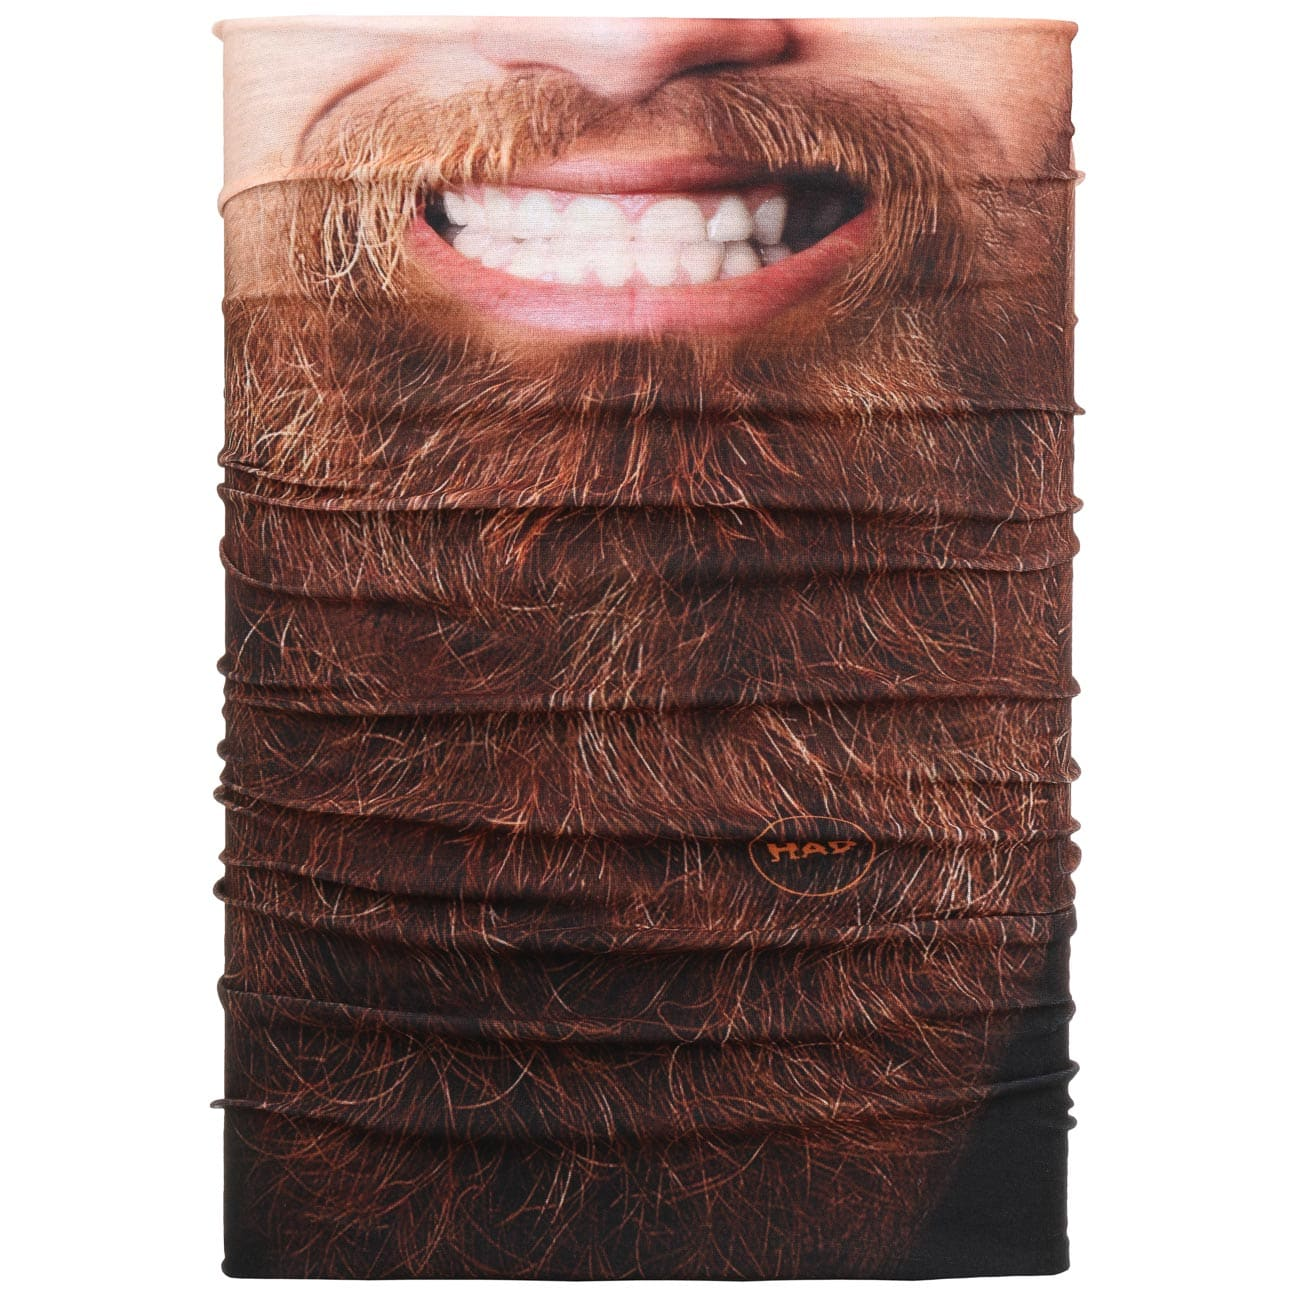 Bandana Multifuncional Barba by H.A.D.  cinta para la cabeza